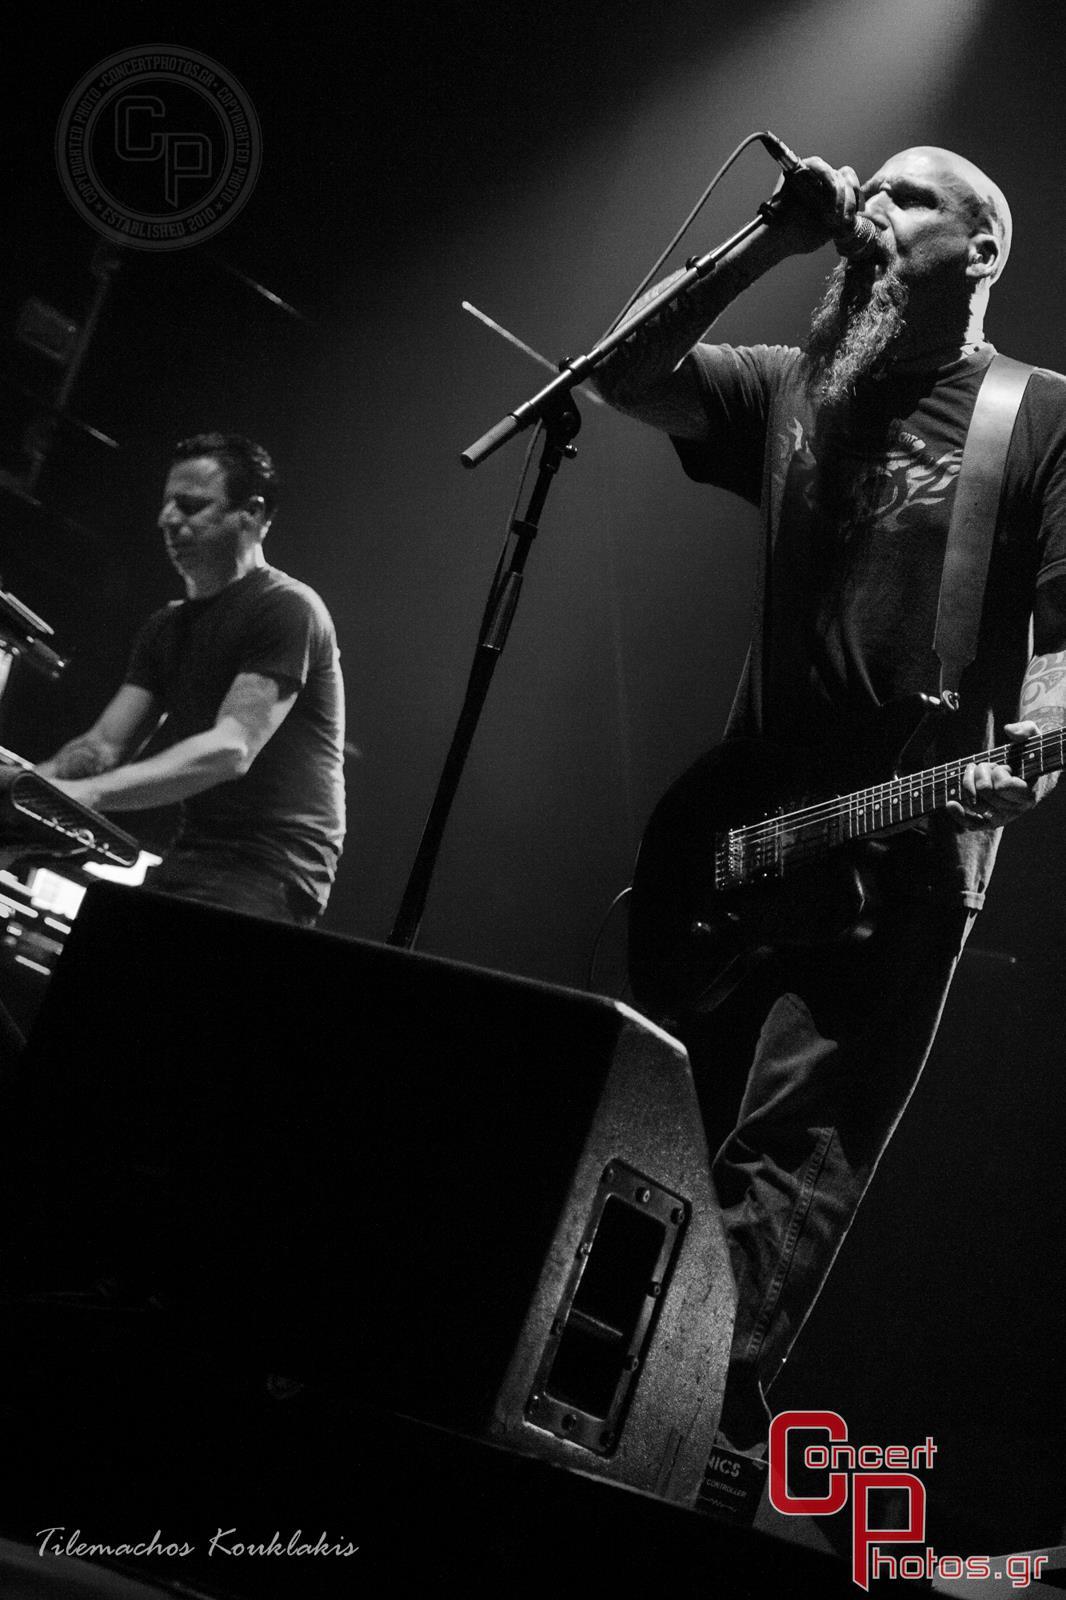 Neurosis-Neurosis photographer:  - concertphotos_20140707_23_56_35-5